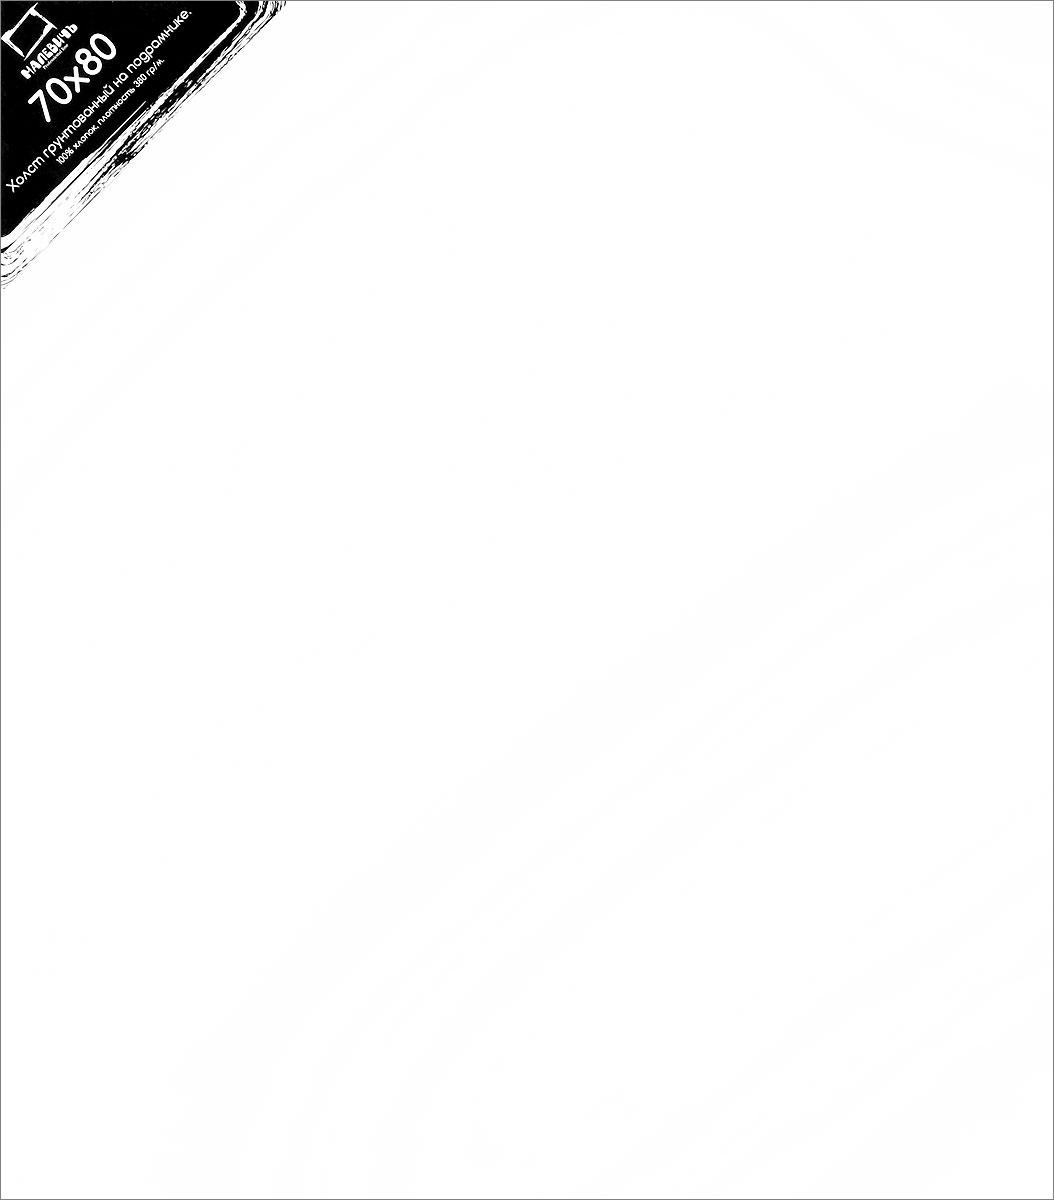 Малевичъ Холст на подрамнике 70 см x 80 см 380 г/м2